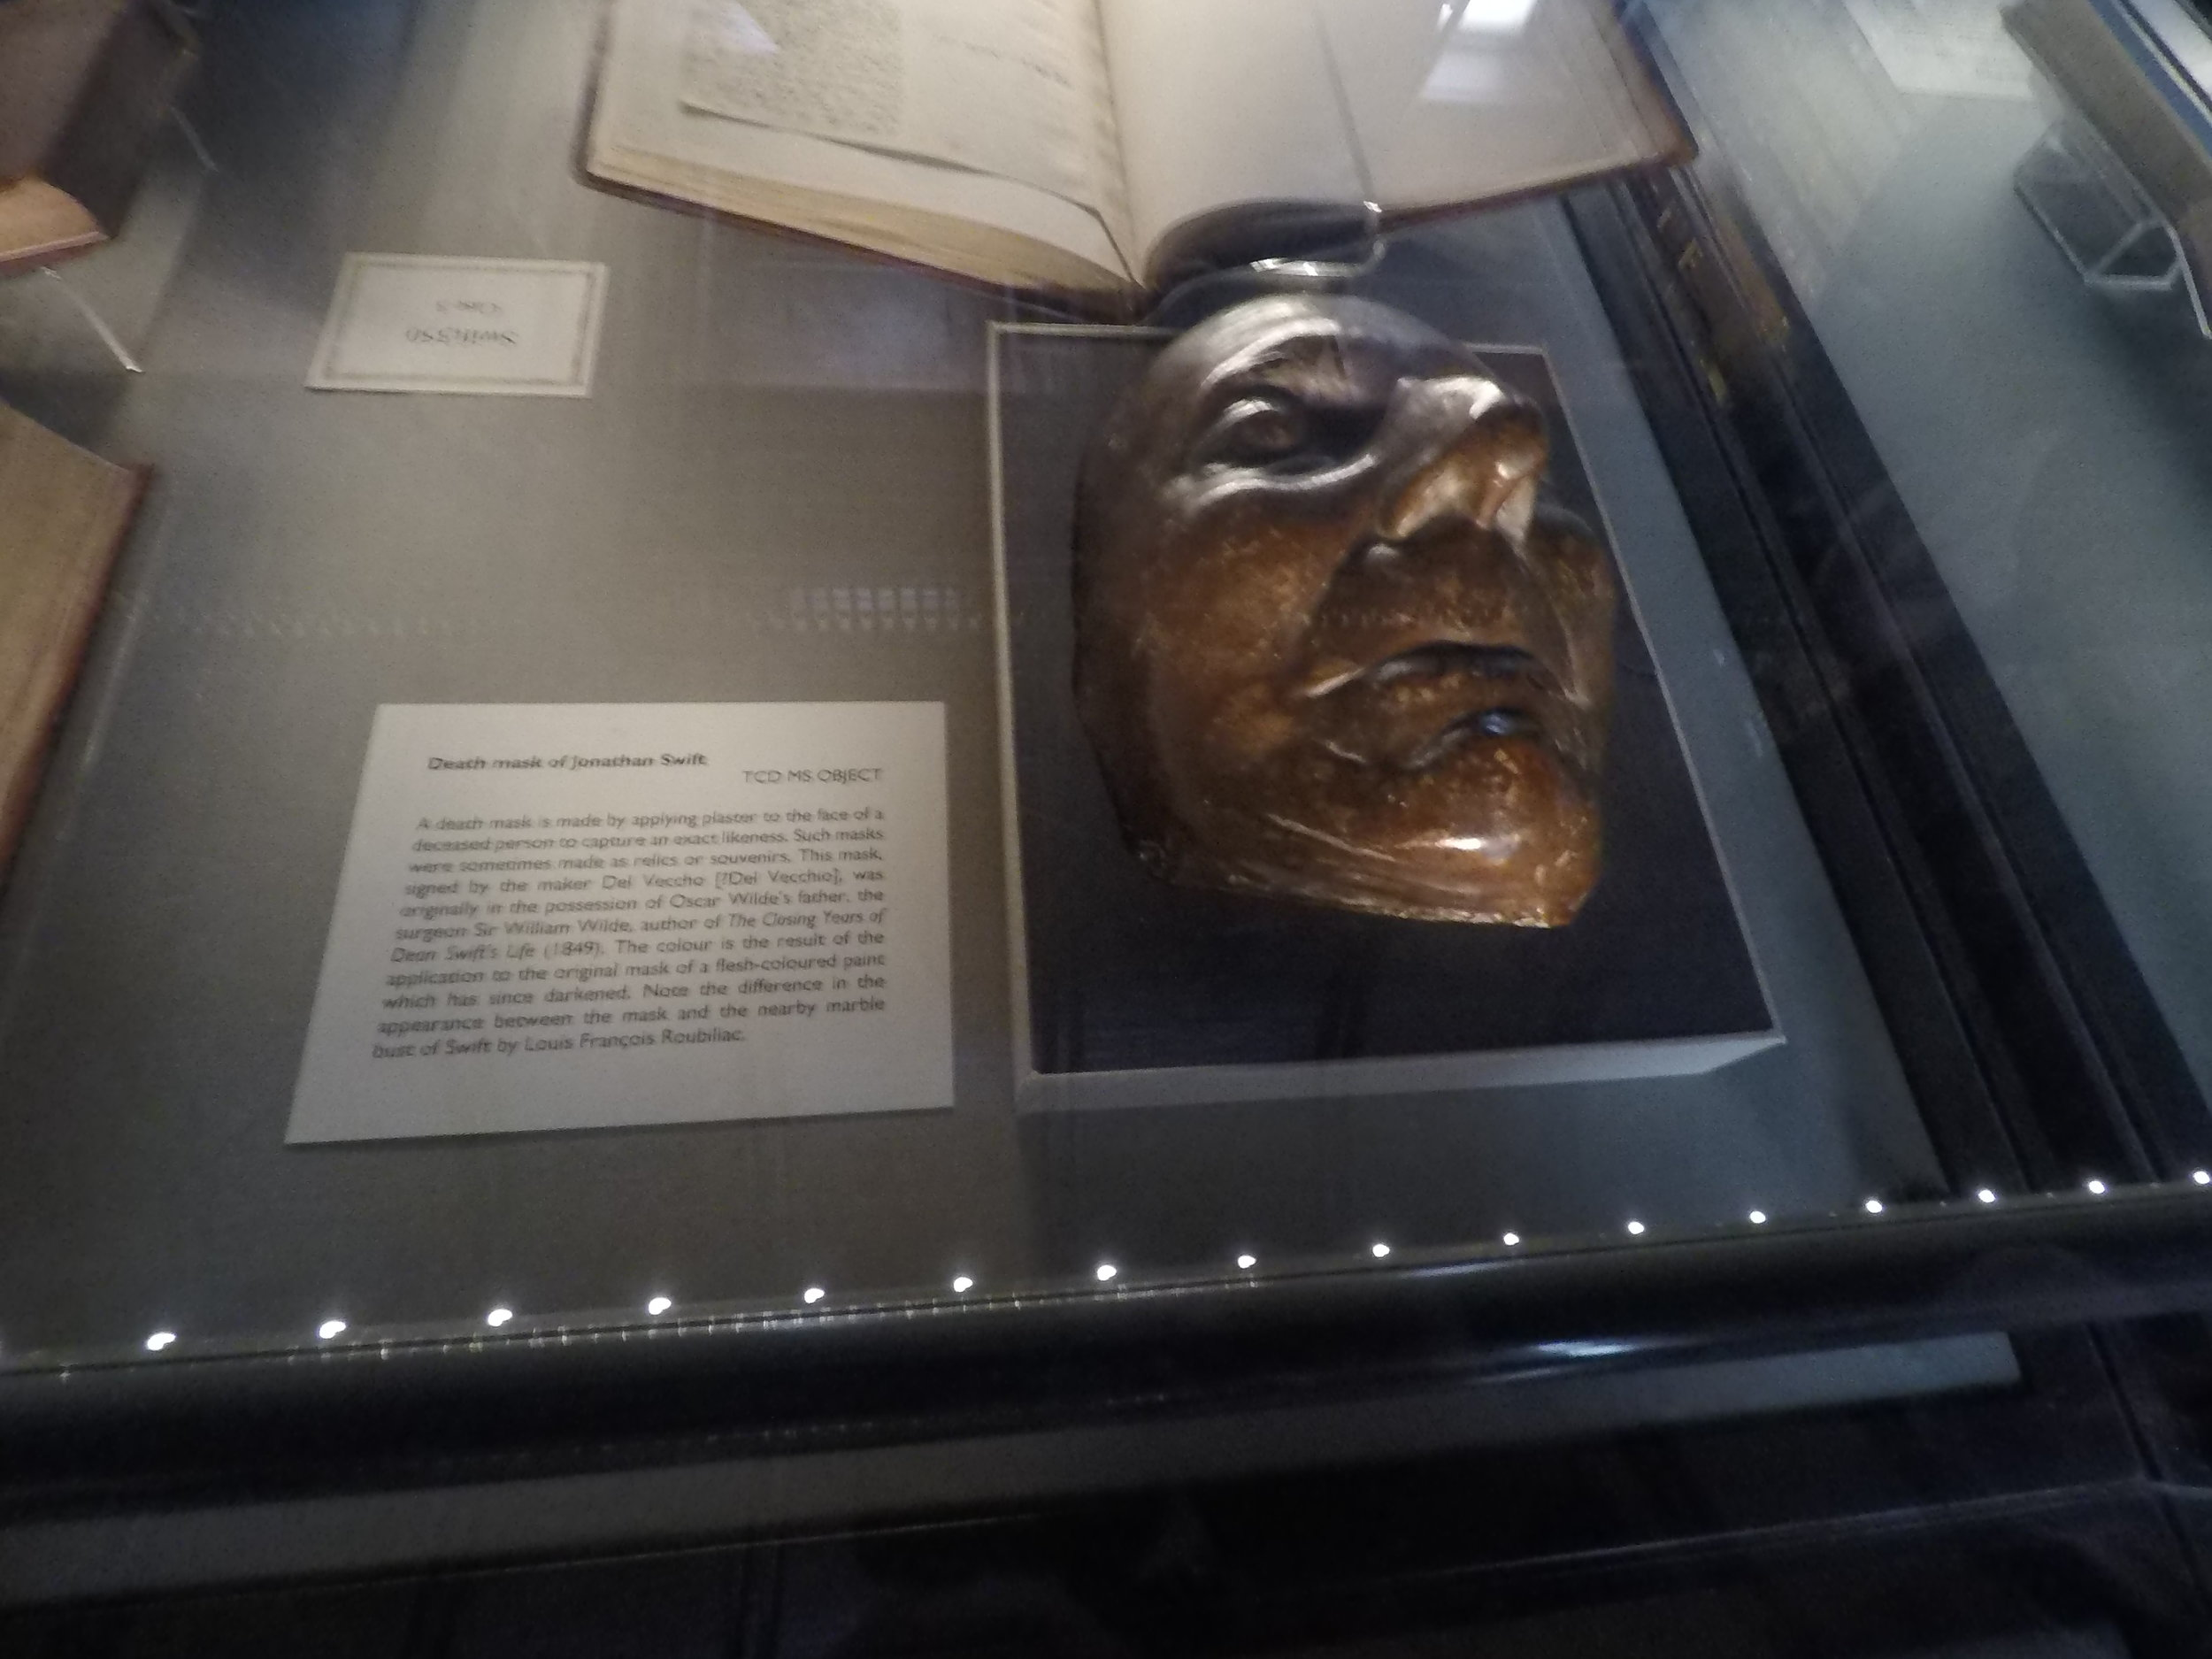 Jonathan Swift's death mask